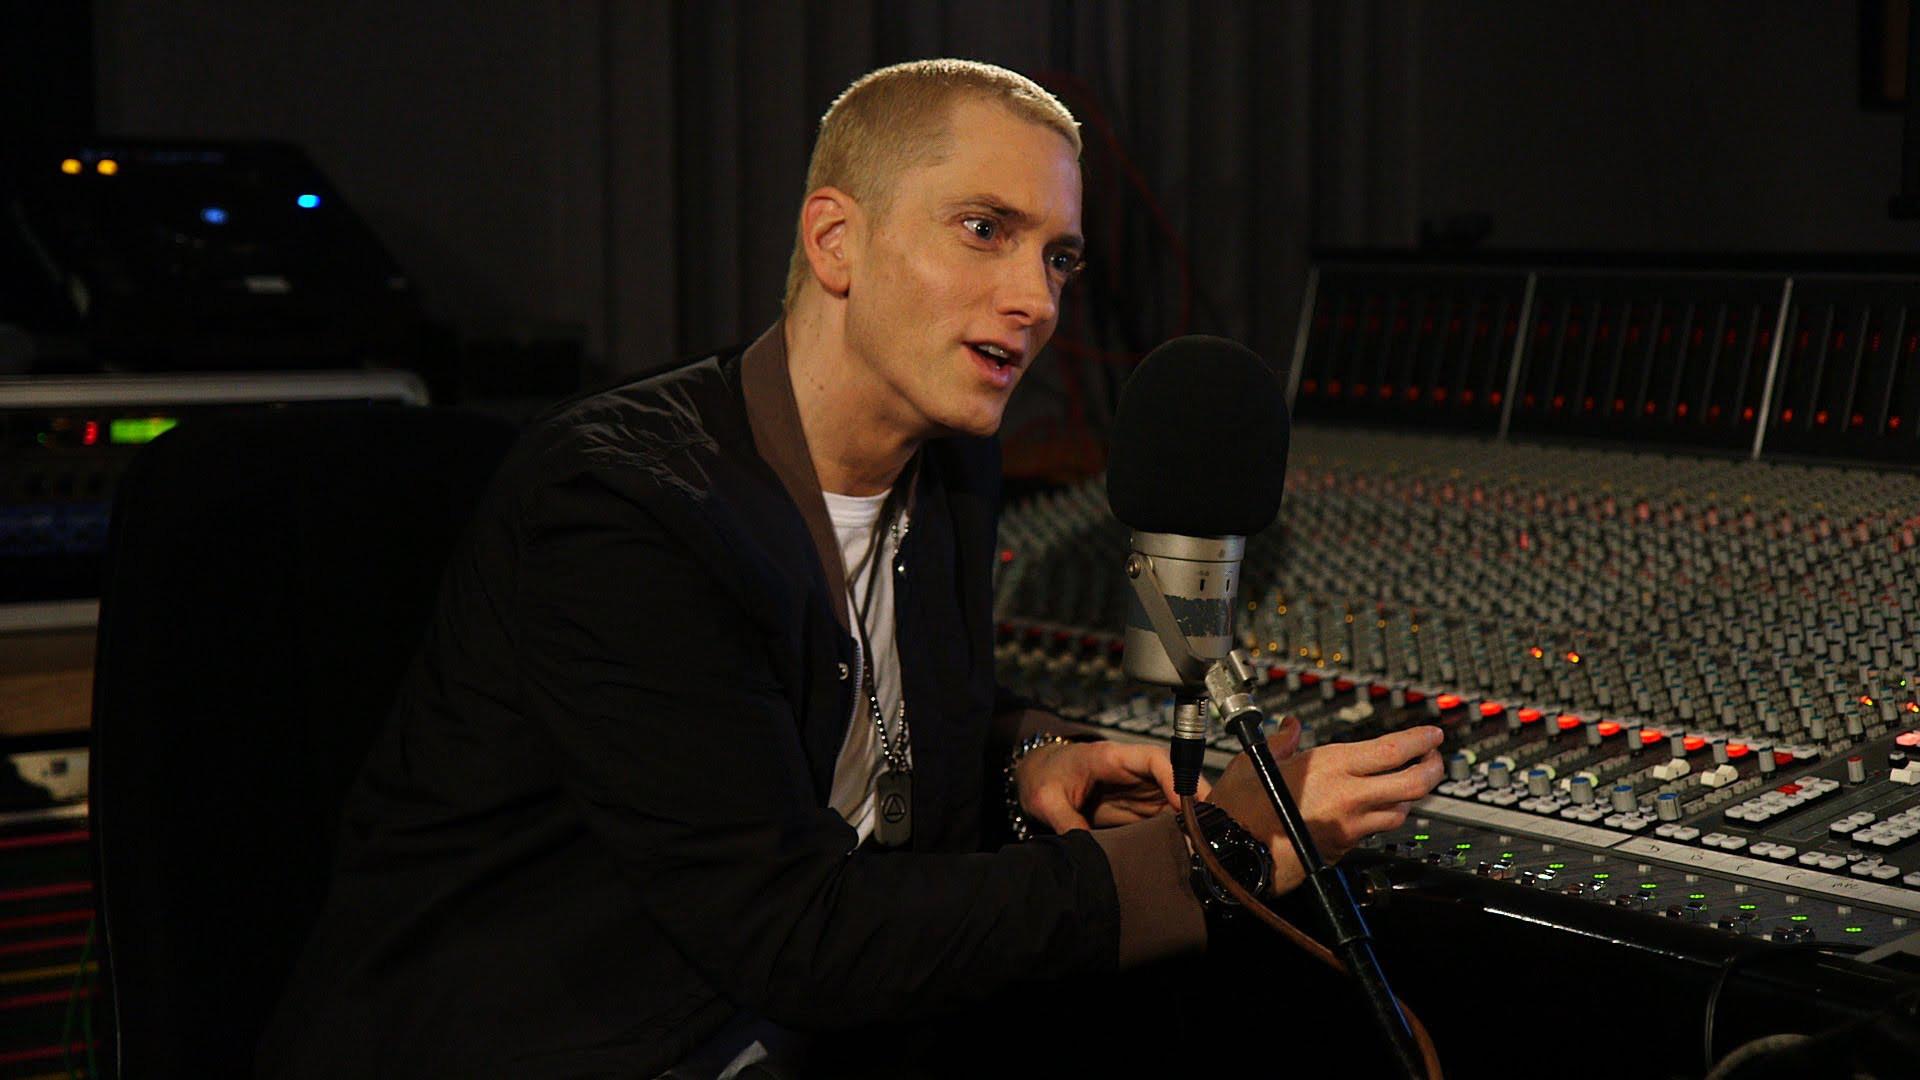 Eminem Studio Rapper Full Hd Wallpaper